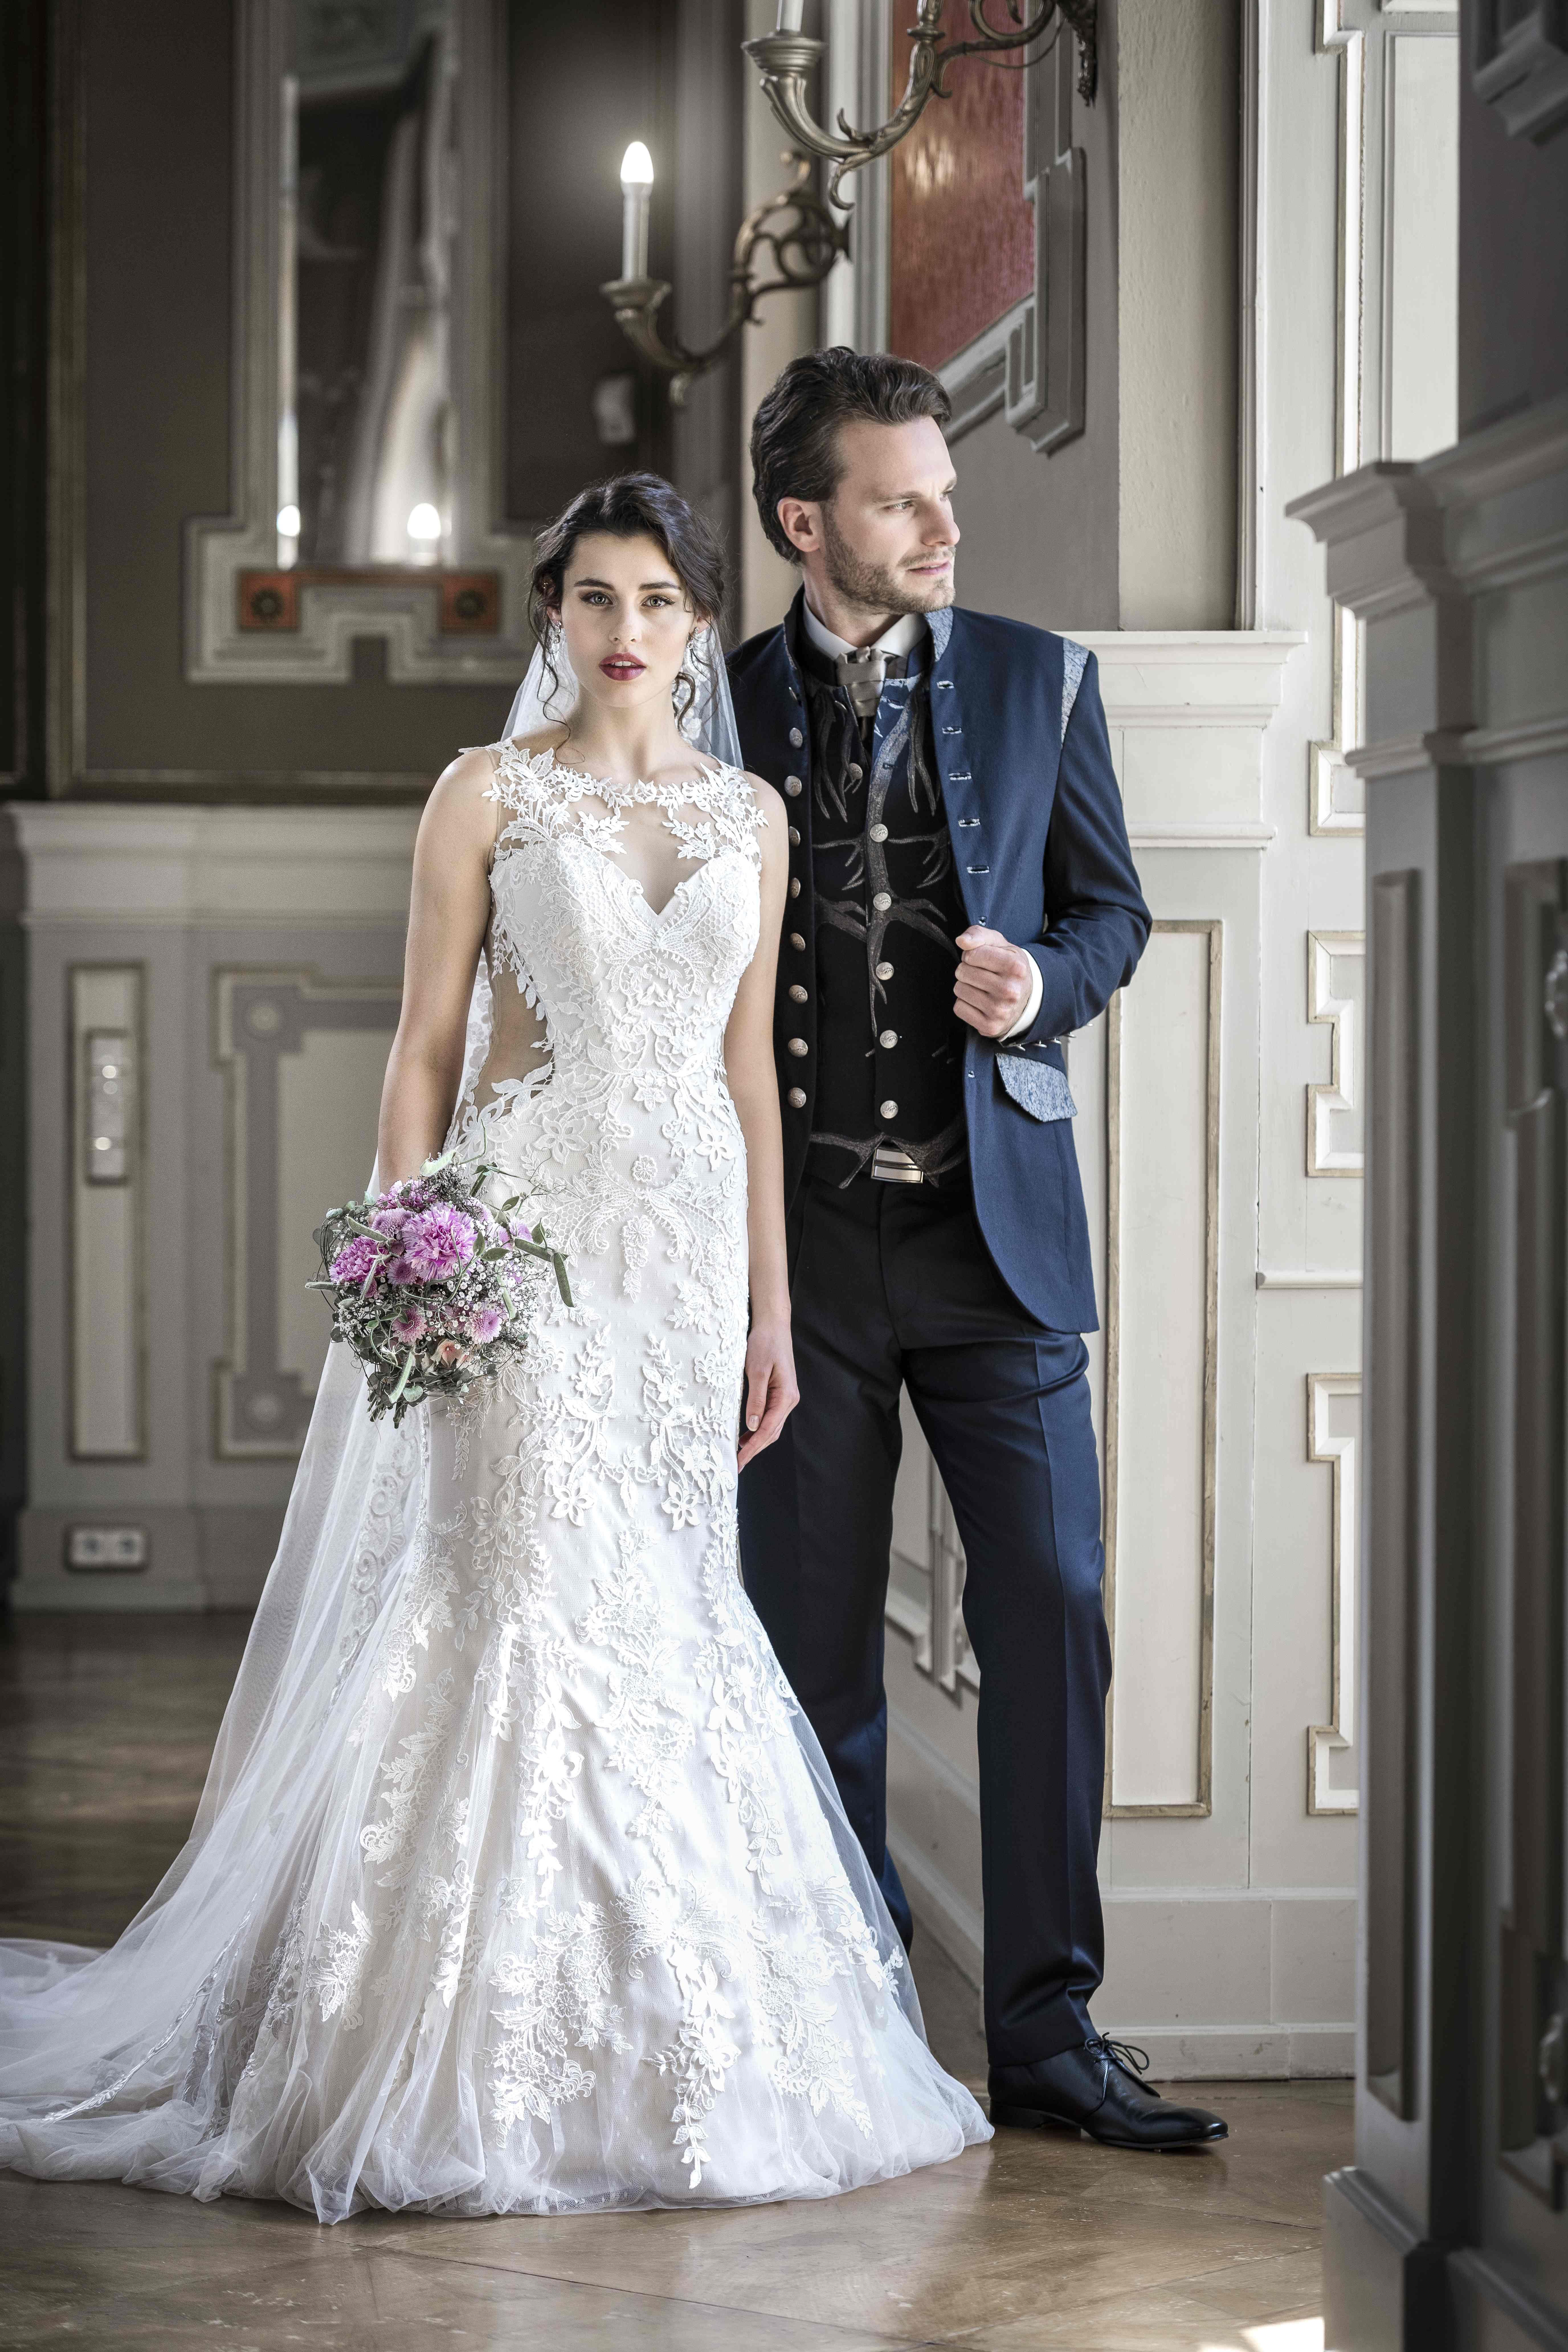 Elegantes Hochzeitspaar Modell: Bianca Puchmüller & Manuel